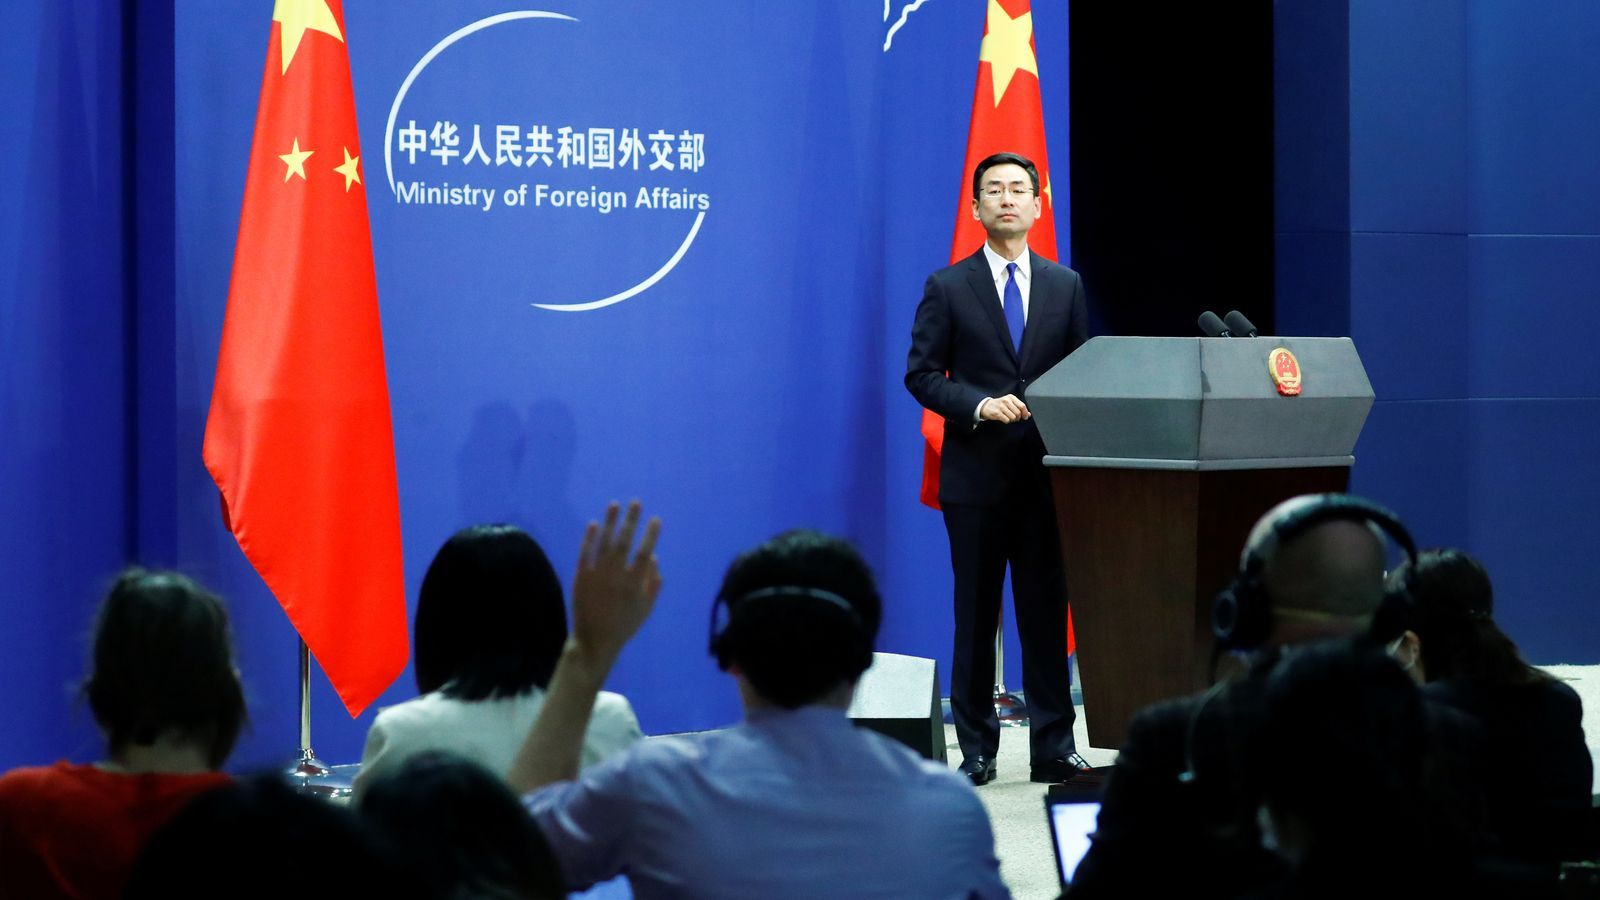 La Xina expulsa els periodistes de 'The New York Times', 'Washington Post' i 'Wall Street Journal'